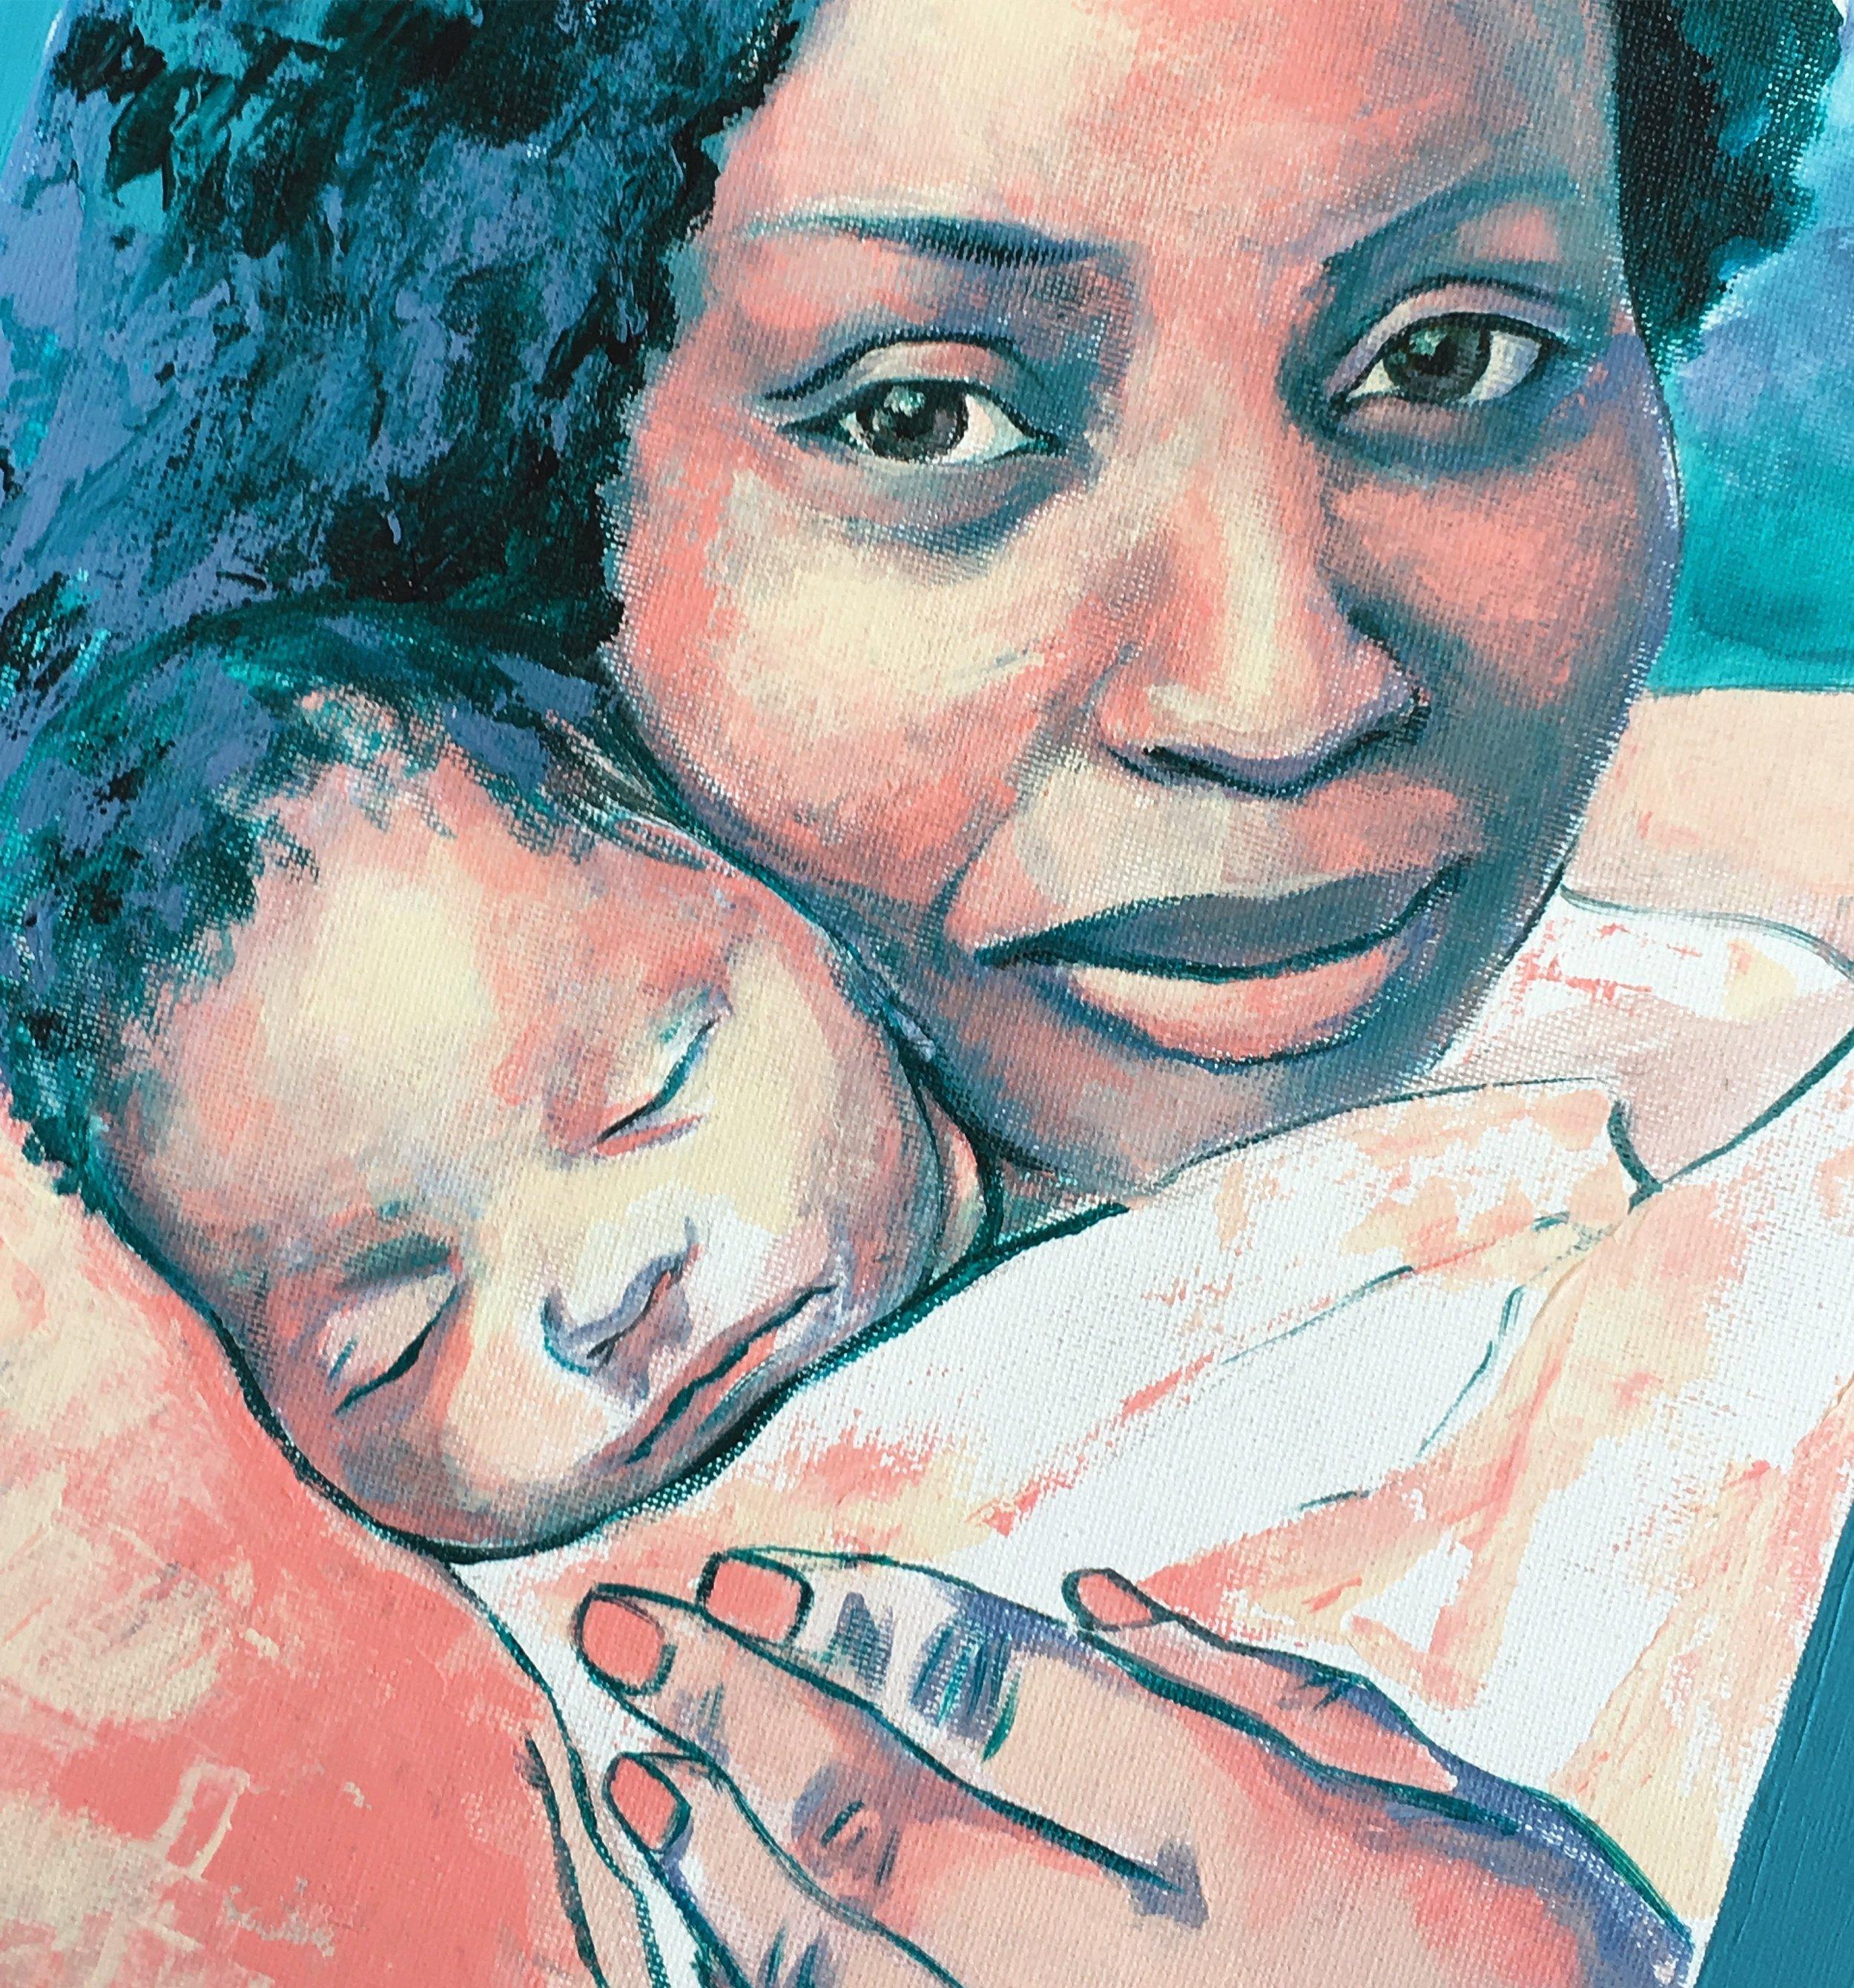 Portrait of Mother & Child (2018)